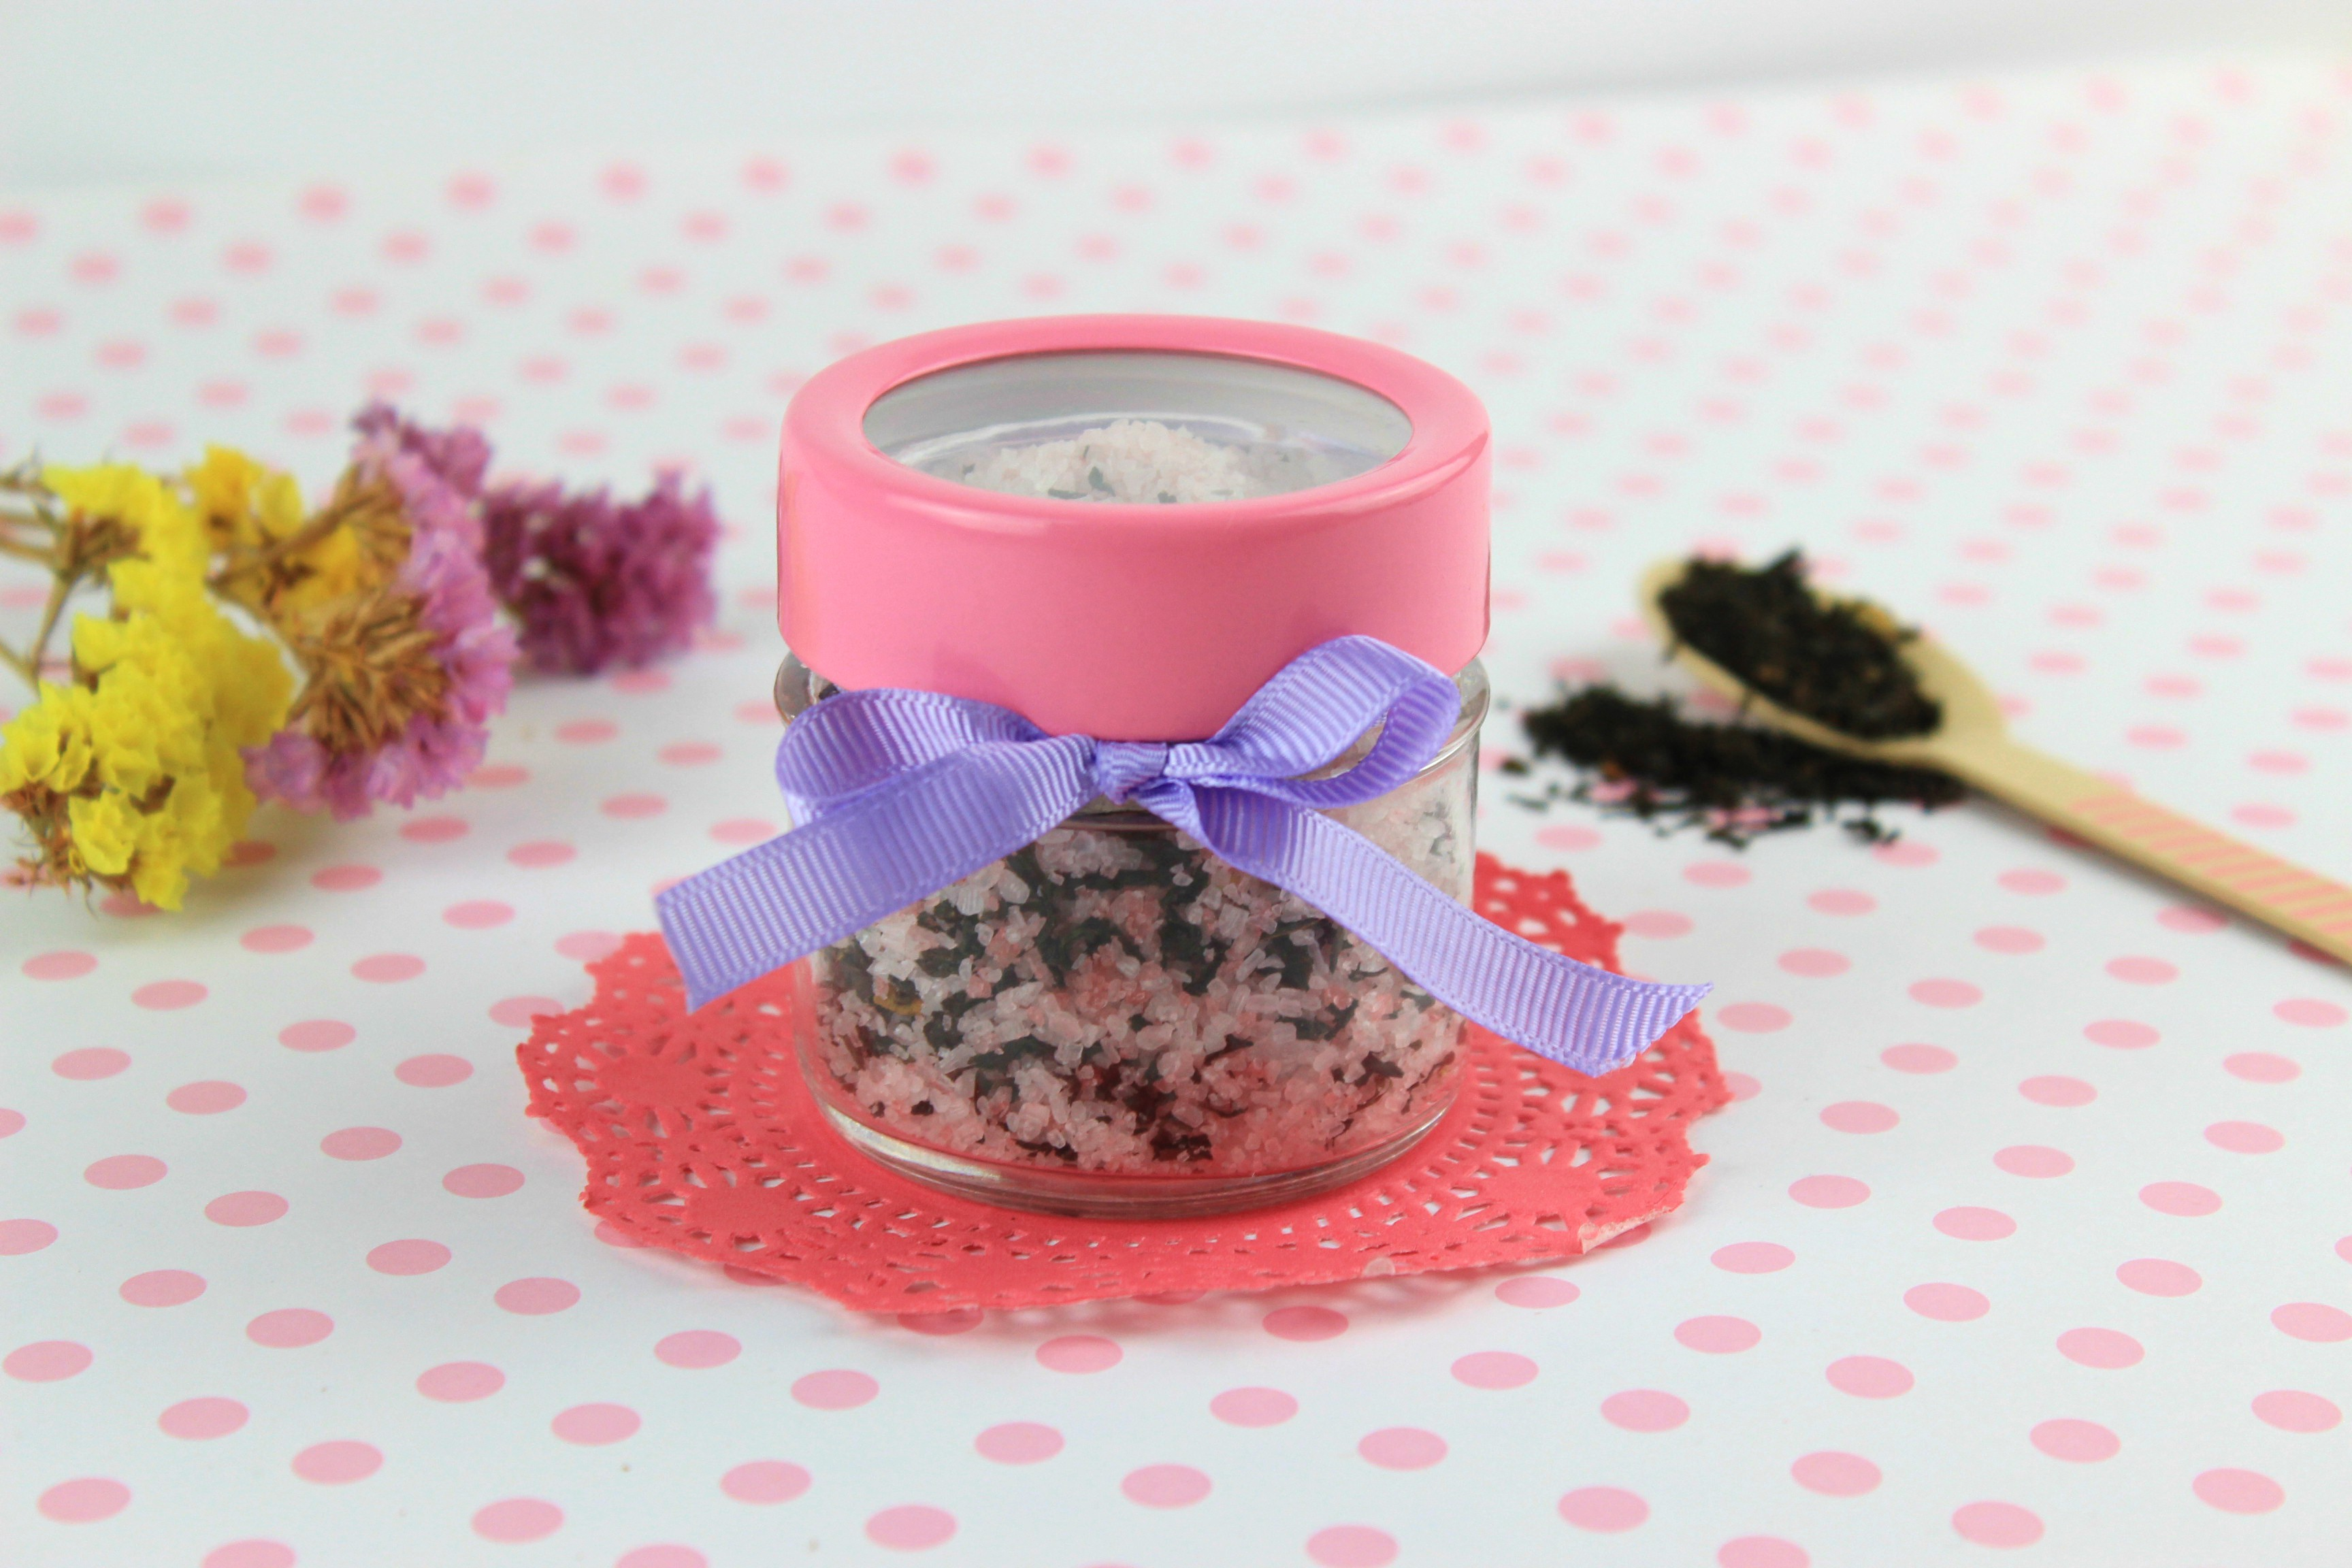 DIY Bath Salts with Aromatic Tea